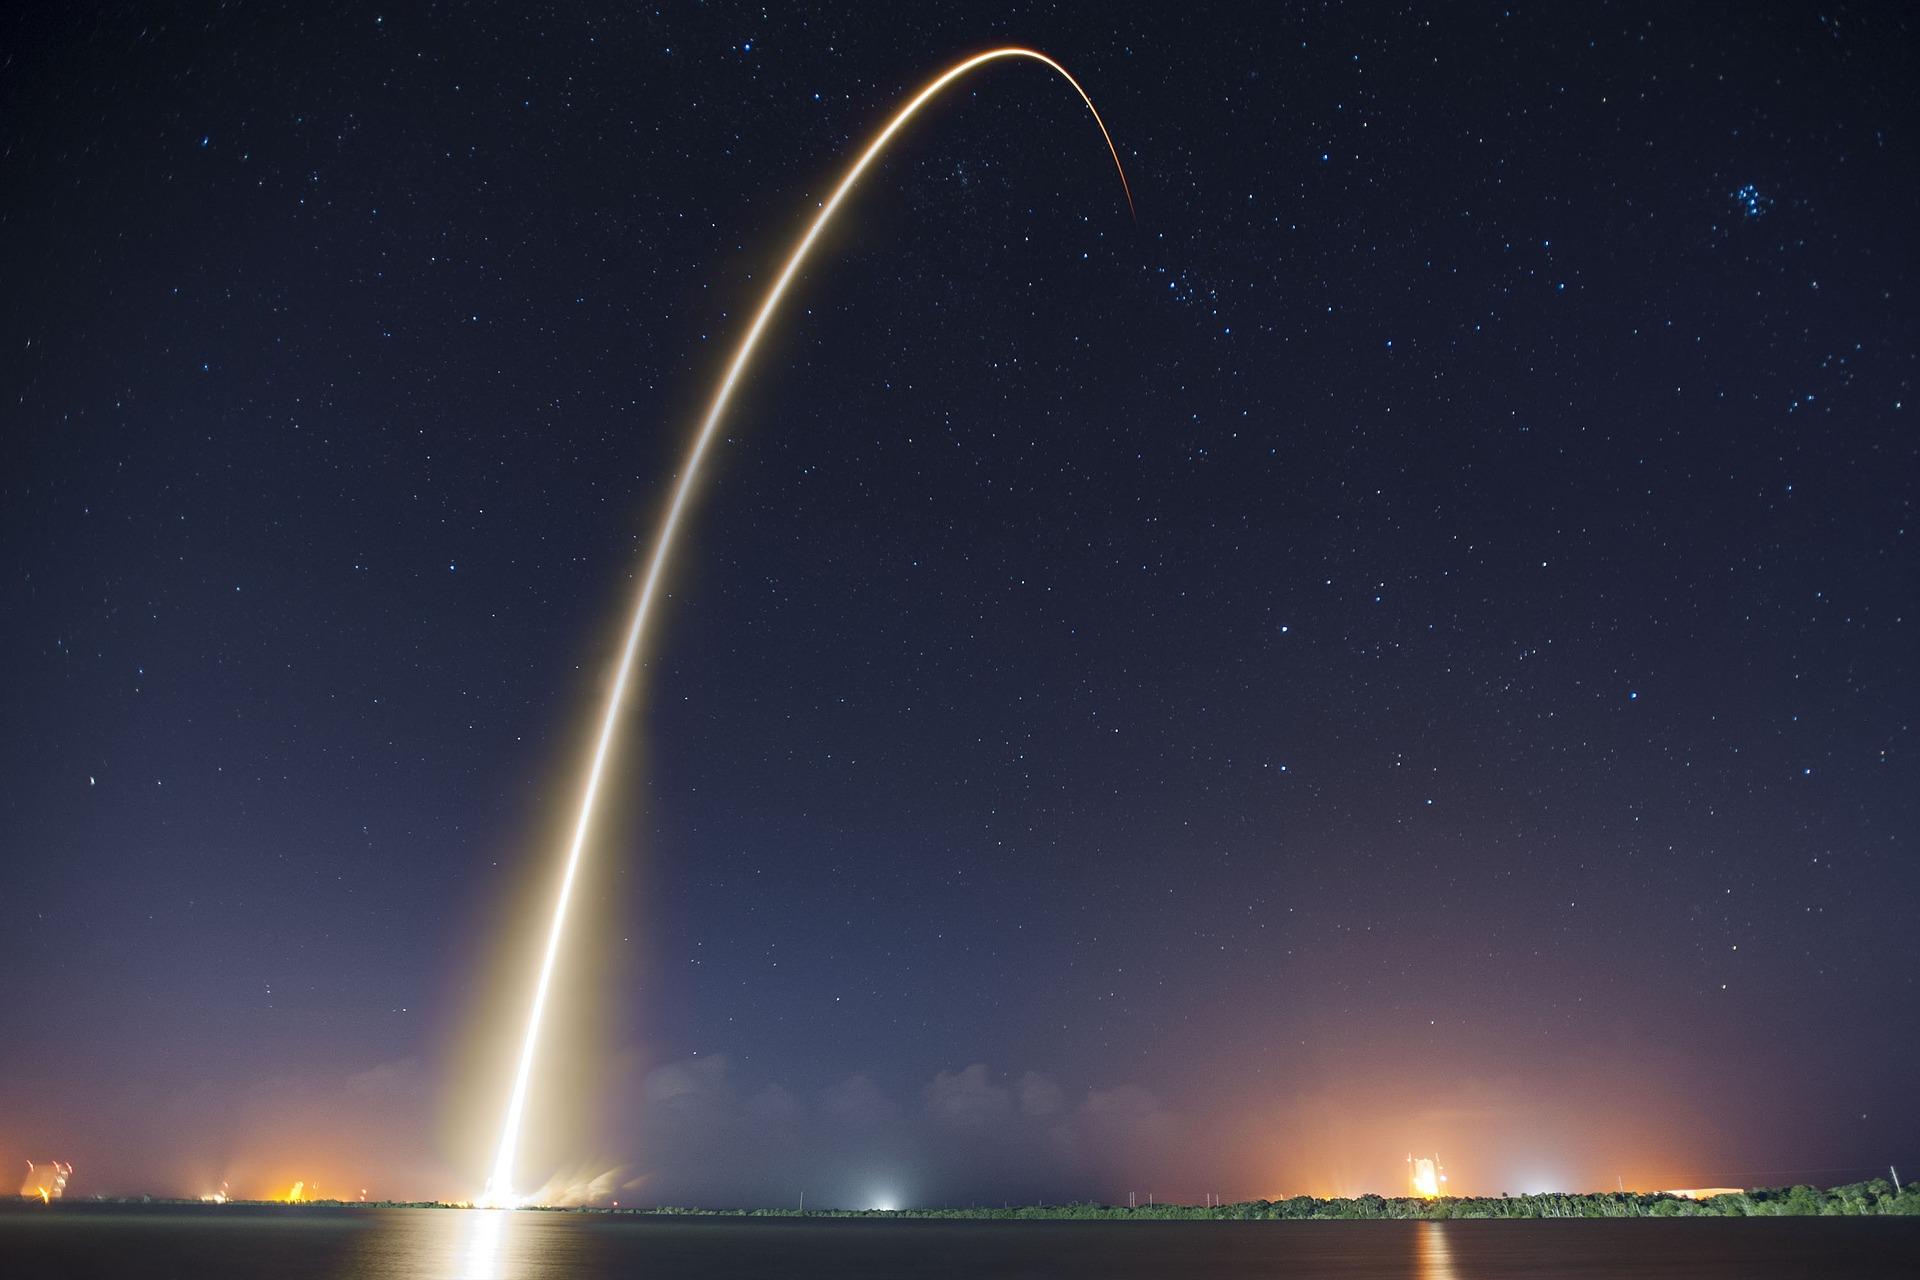 Raketenstart, Zukunft, Reise ins Weltall